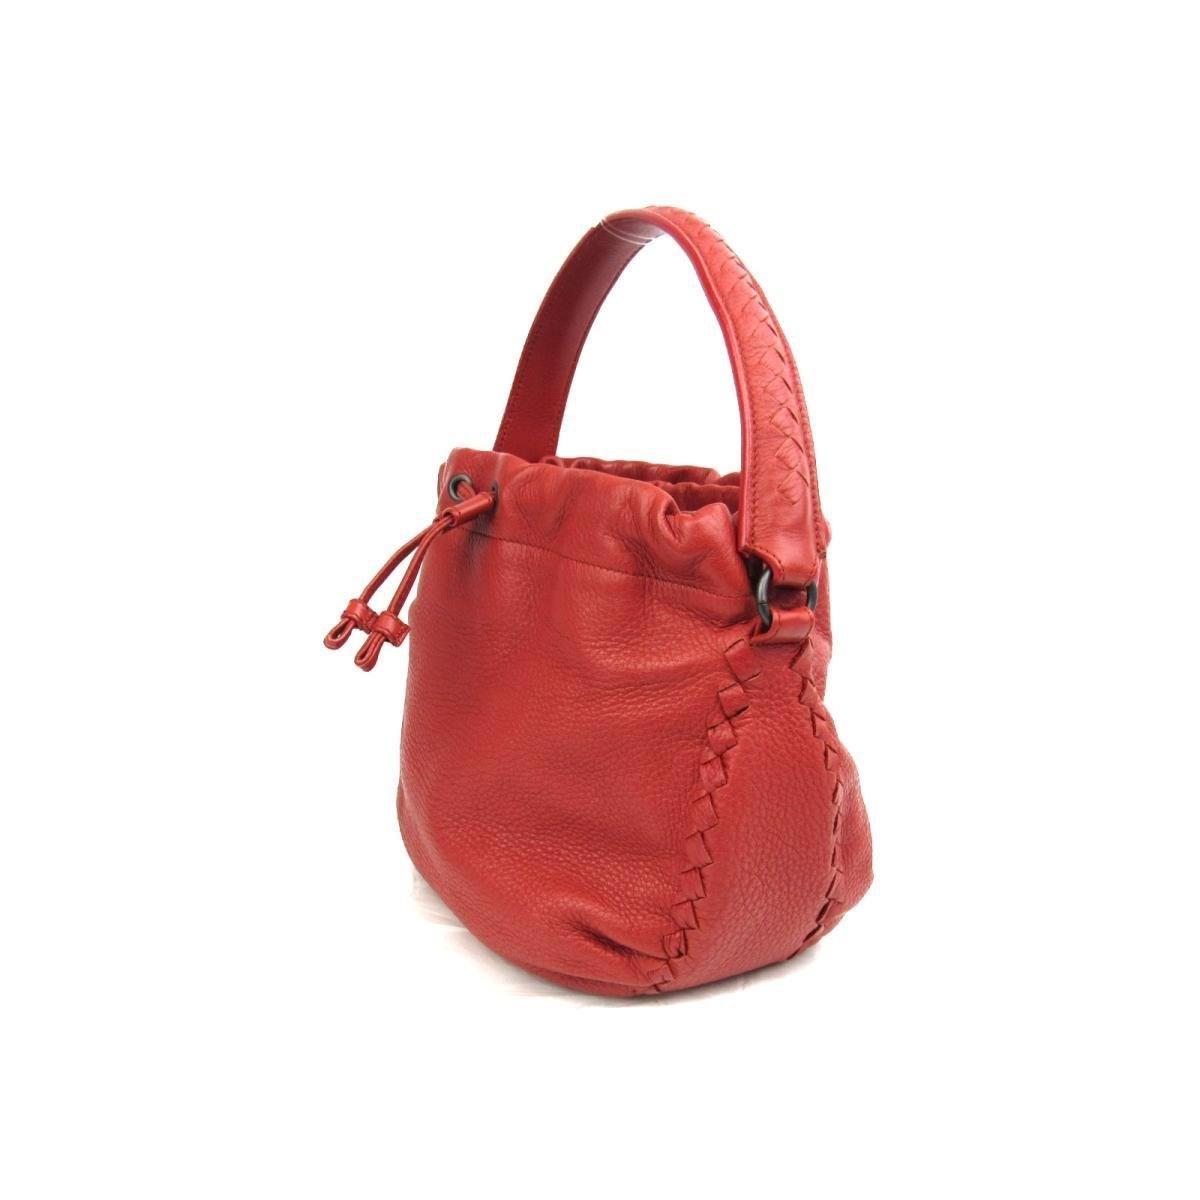 Lyst - Bottega Veneta Authentic Drawstring Hand Bag Leather Red Used ... fdcc64ef0b181